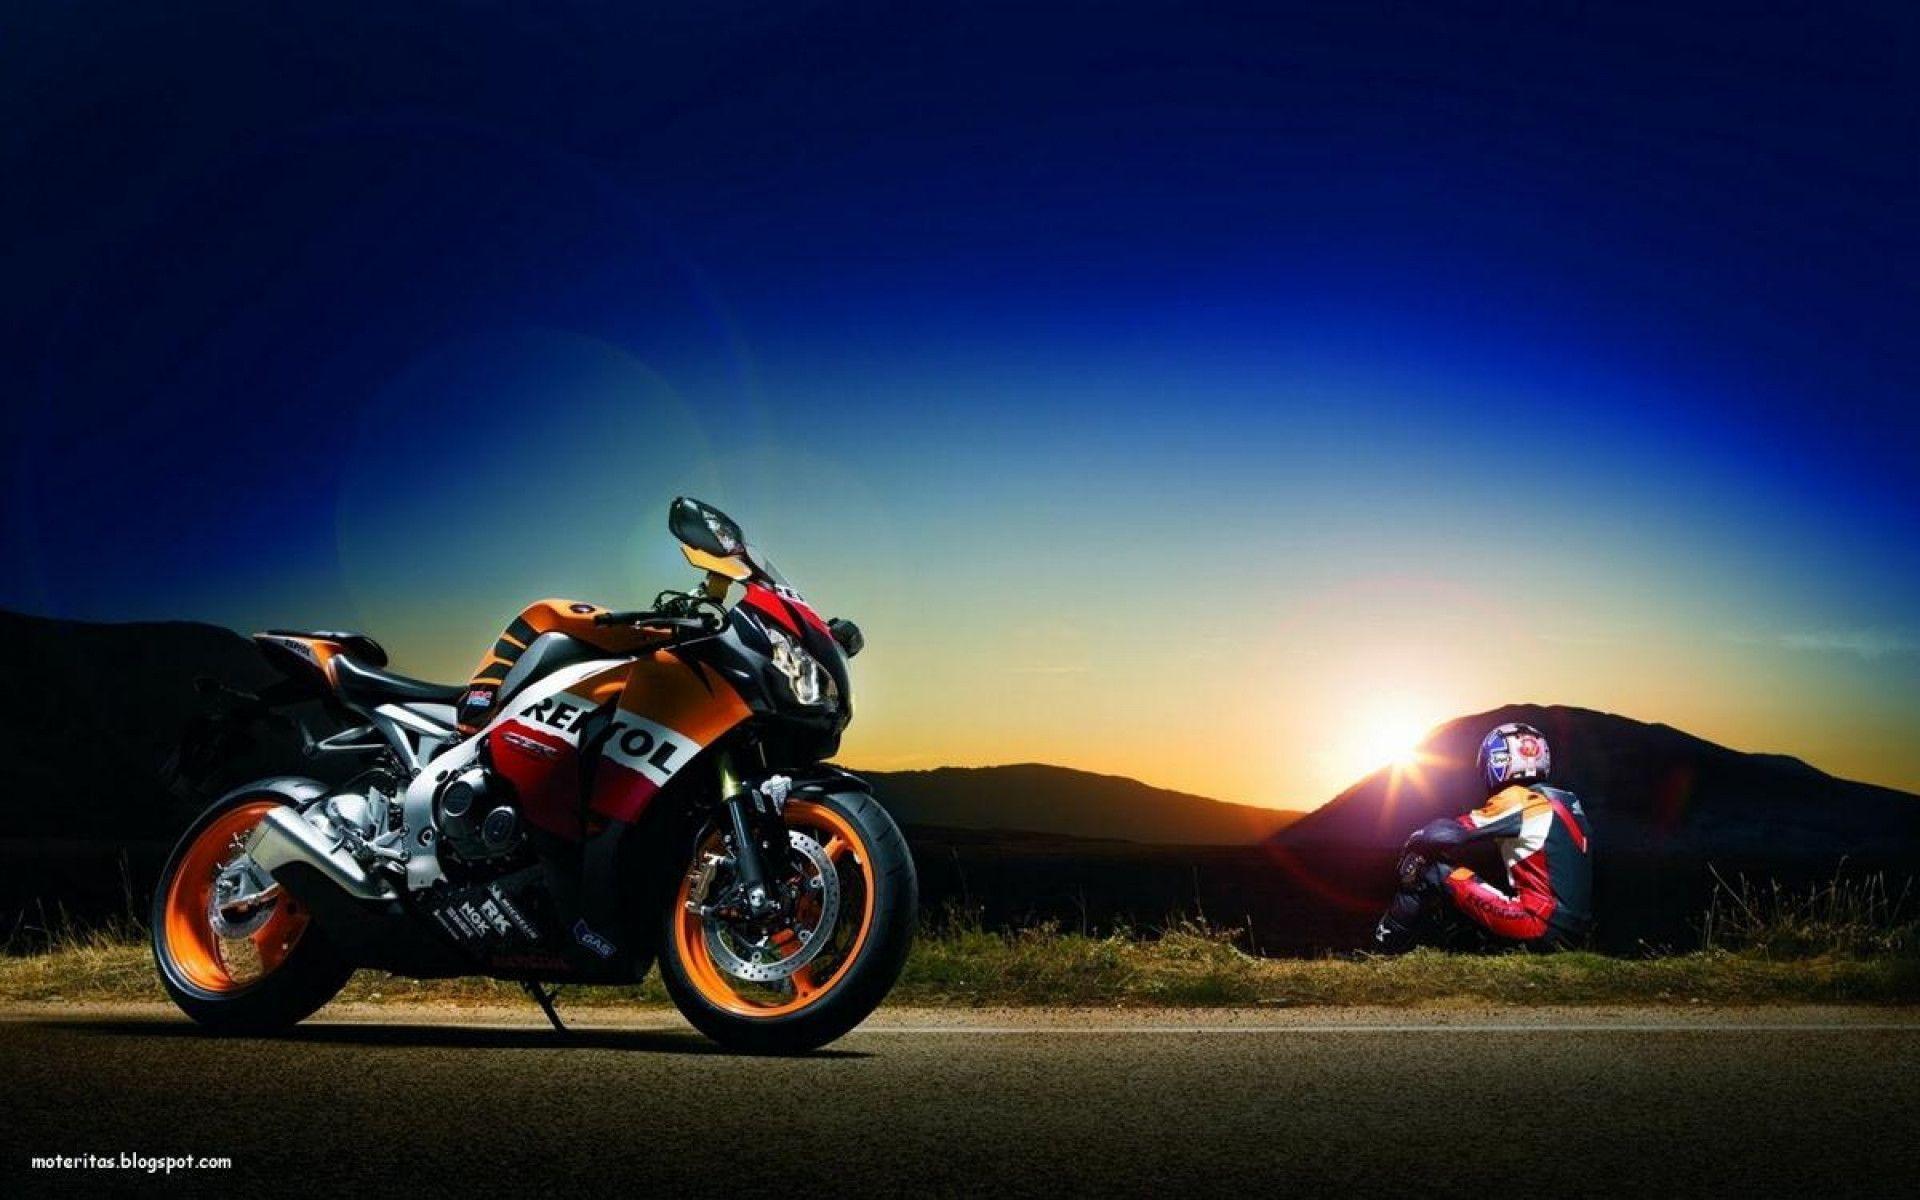 motor sports full hd - photo #28